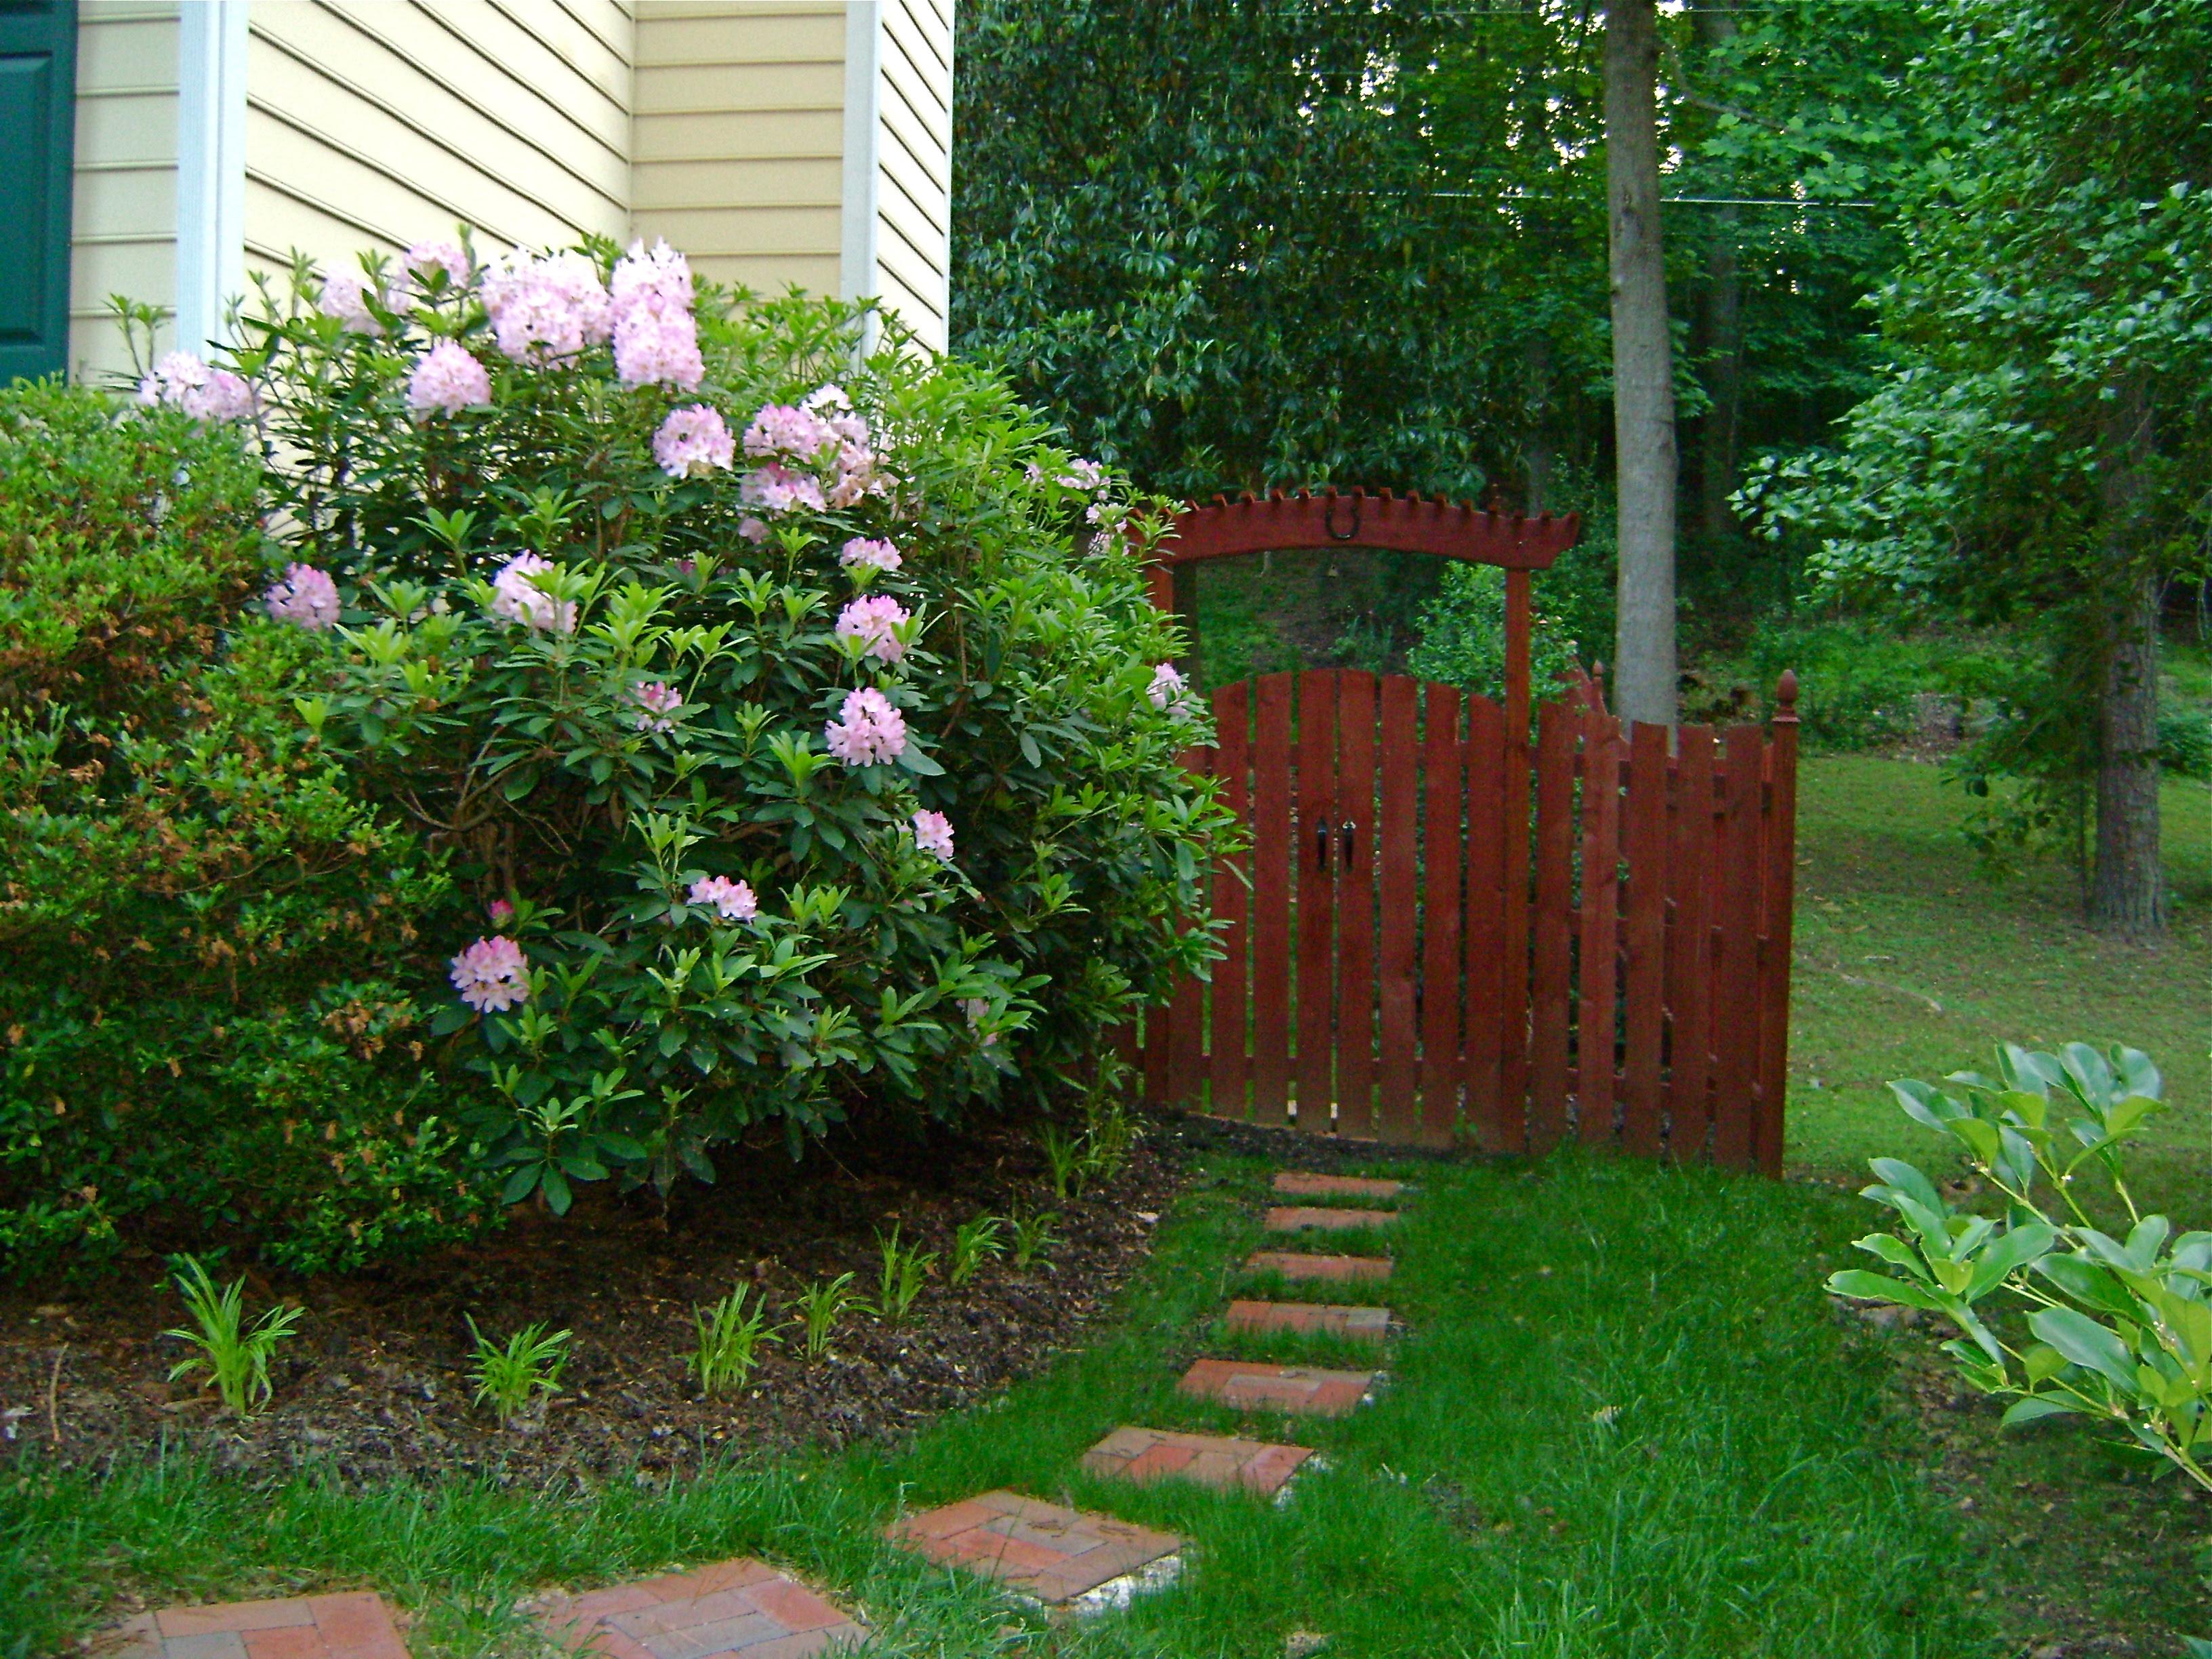 Easy Backyard Landscaping Ideas For Beginners In Square: Landscaping Tips For Beginners